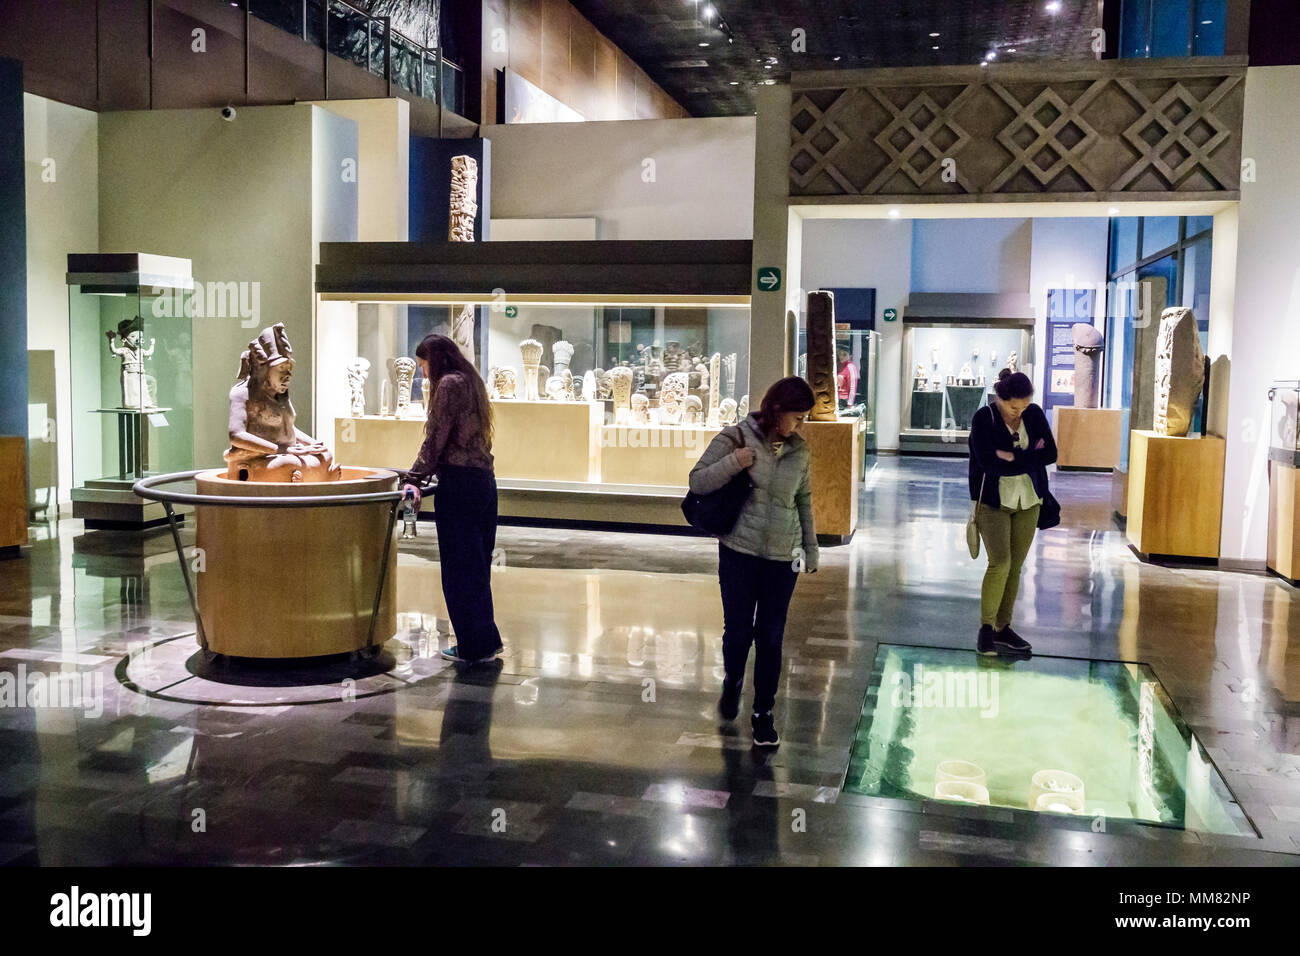 Mexico City Mexico Ciudad de Federal District Distrito DF D.F. CDMX Polanco Hispanic Mexican Museo Nacional de Antropologia National Museum of Anthropology interior exhibit Tlazolteotl clay sculpture woman looking North America American - Stock Image